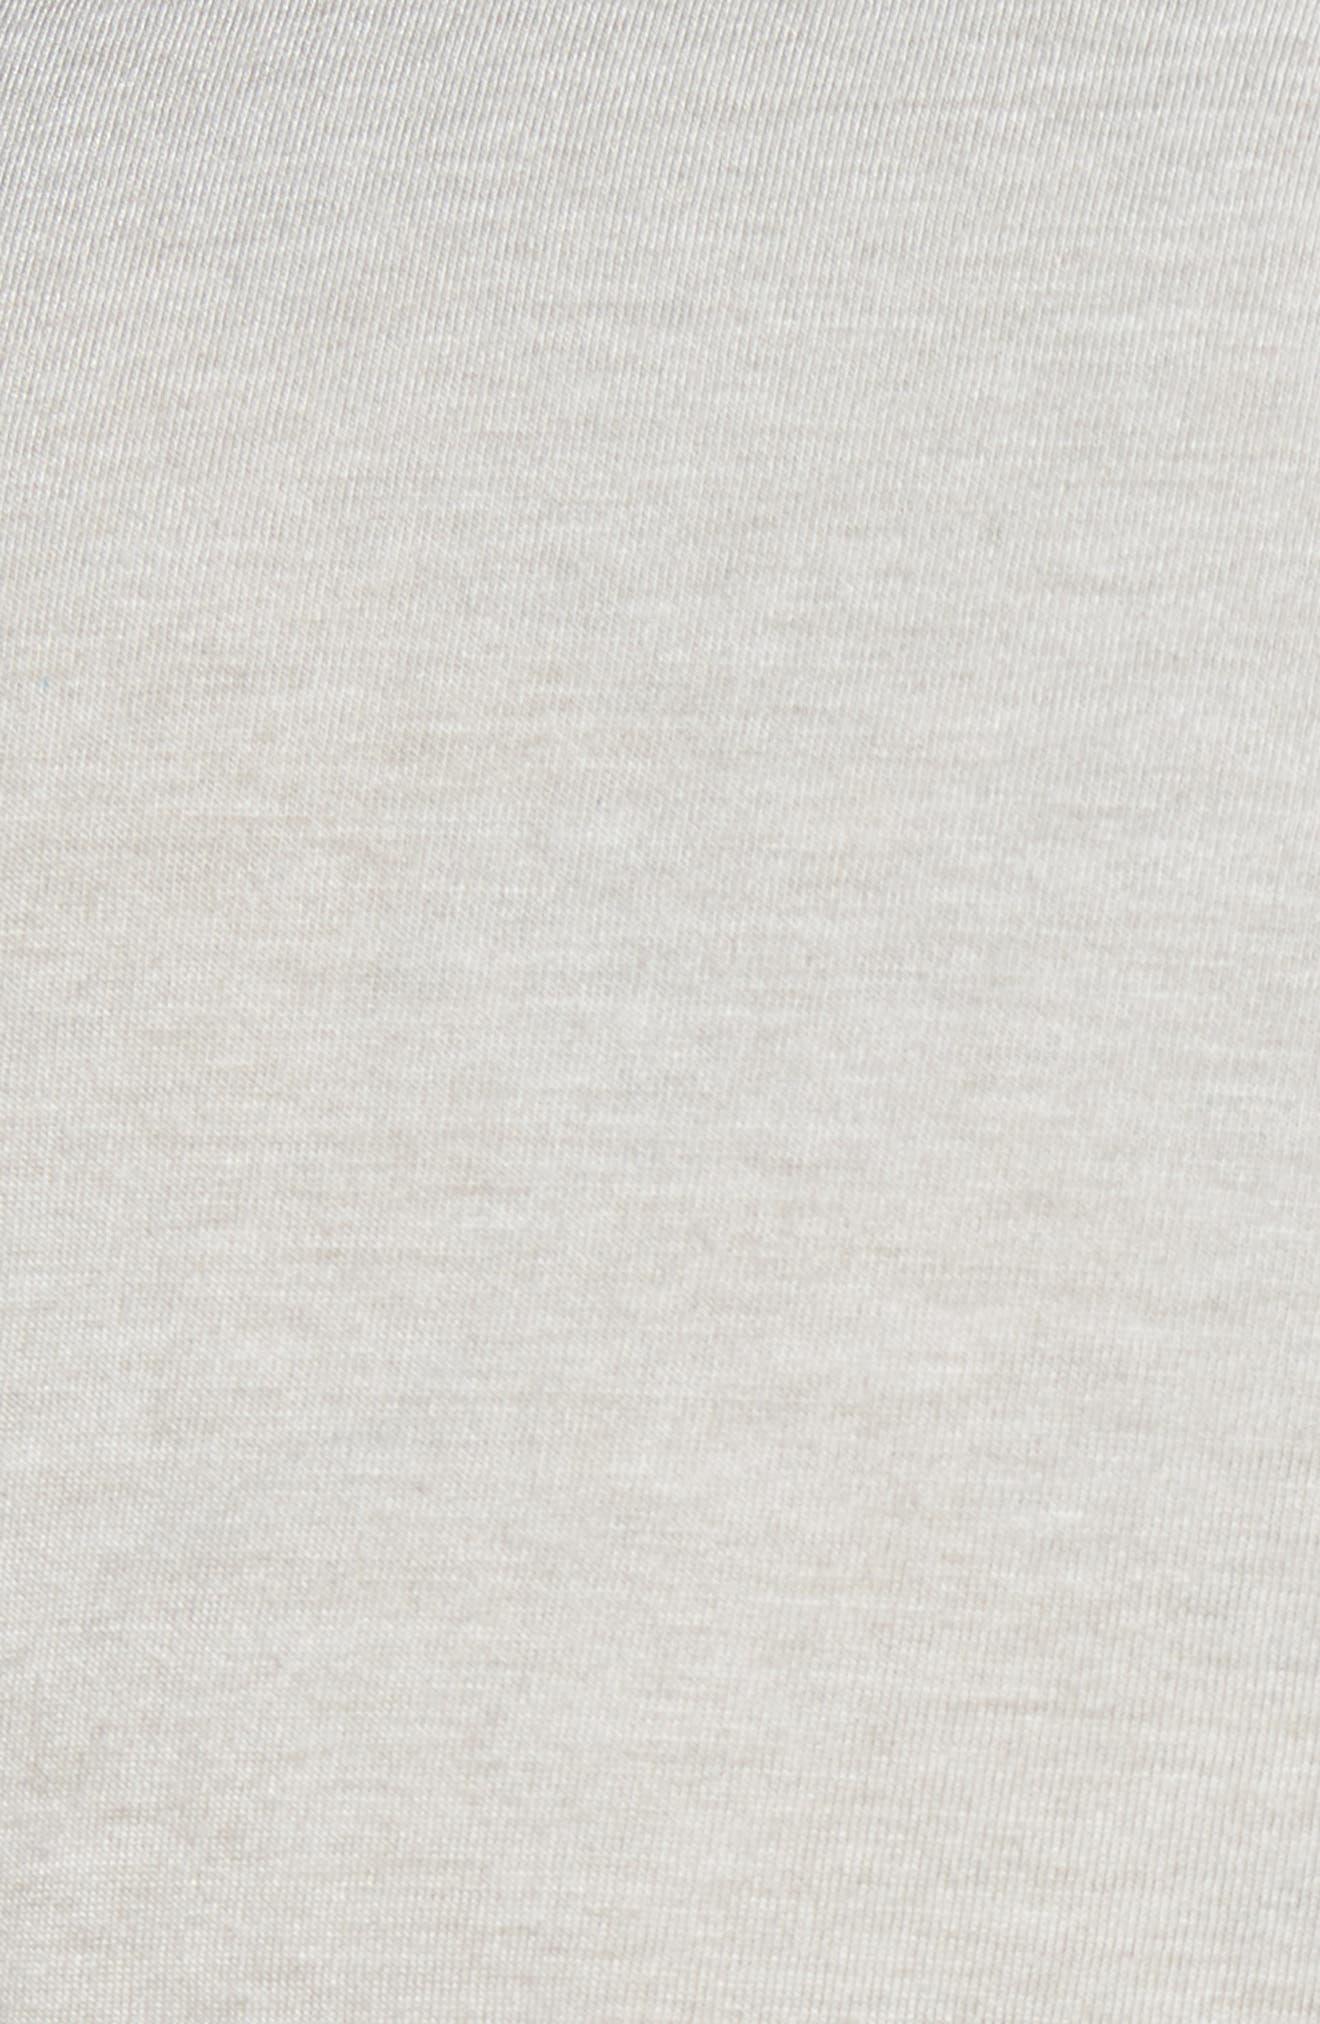 Slim Fit Crewneck T-Shirt,                             Alternate thumbnail 17, color,